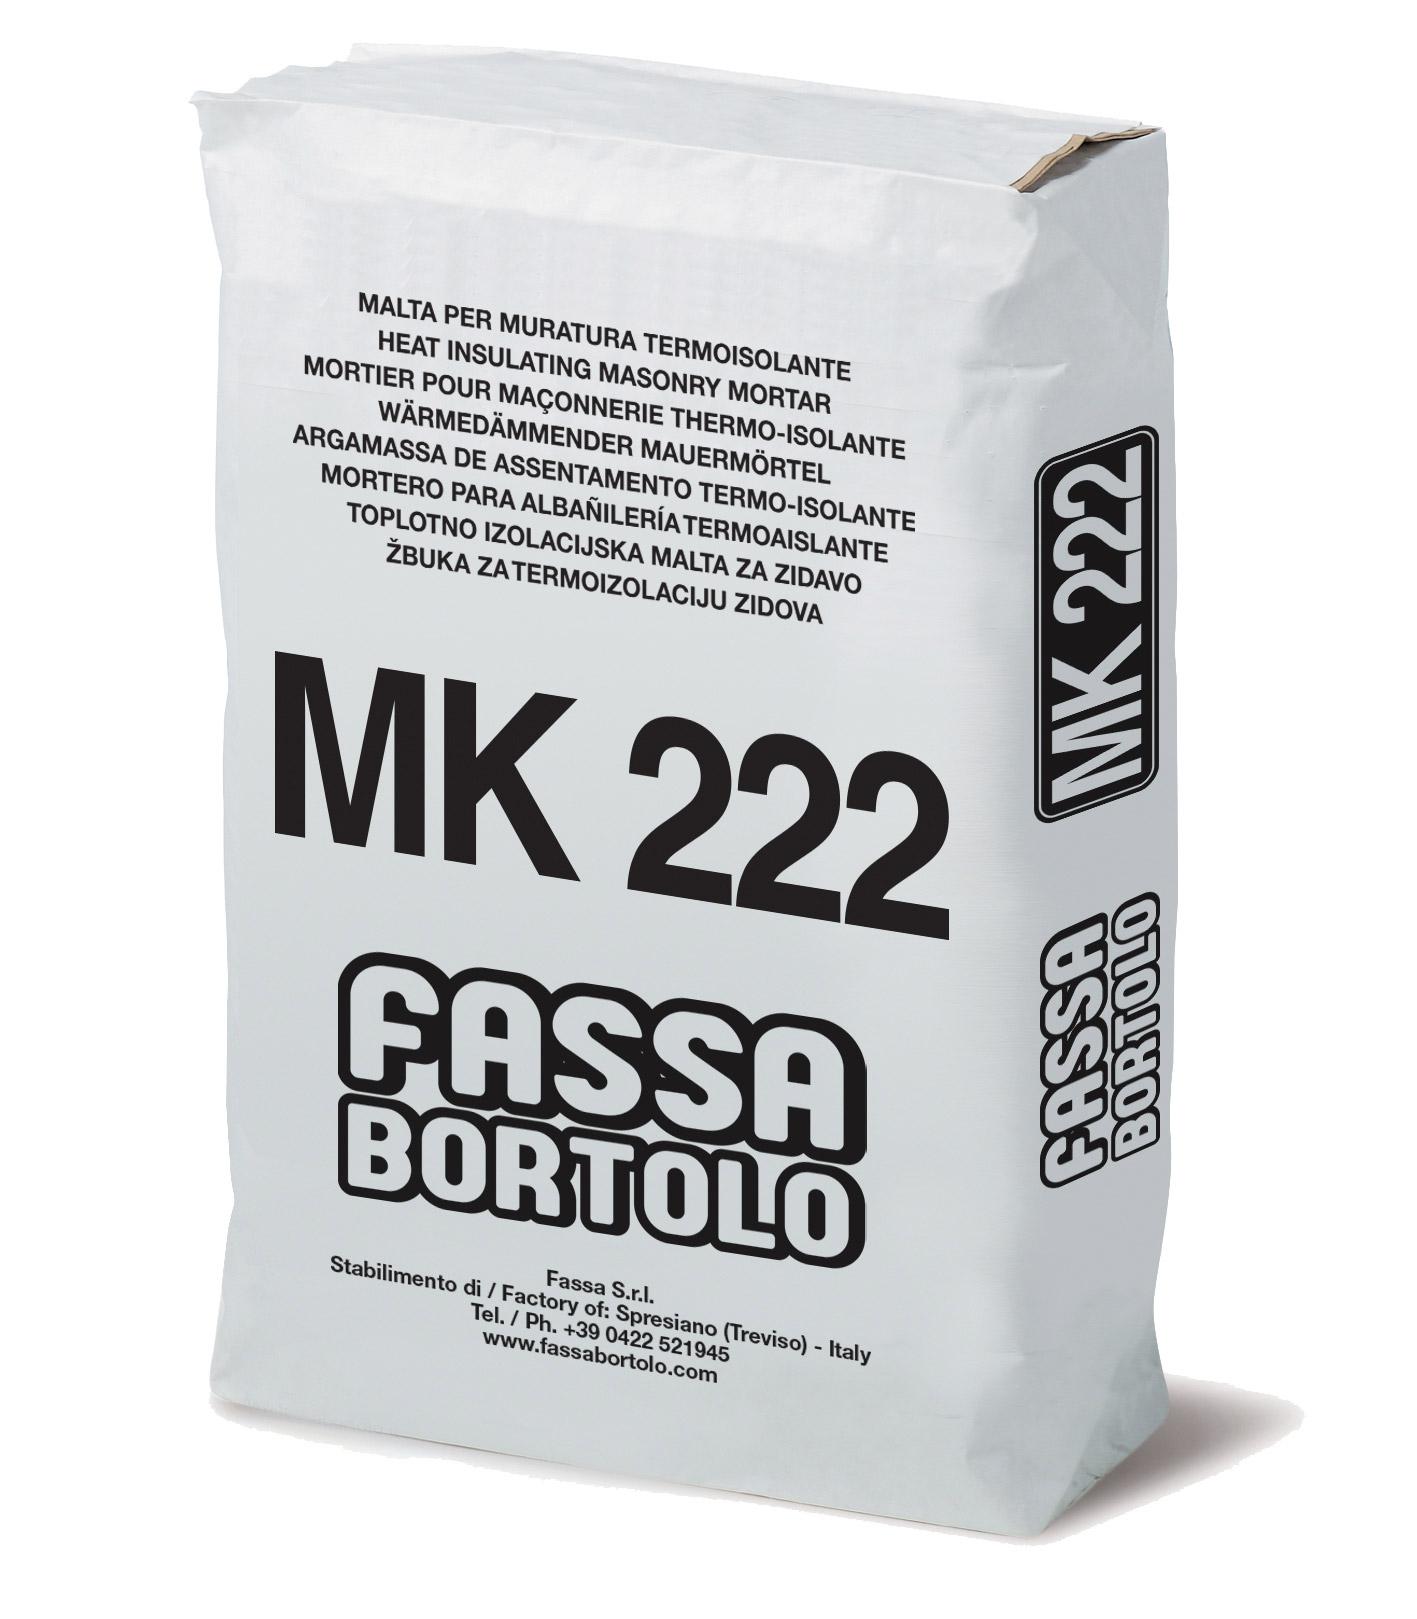 MK 222